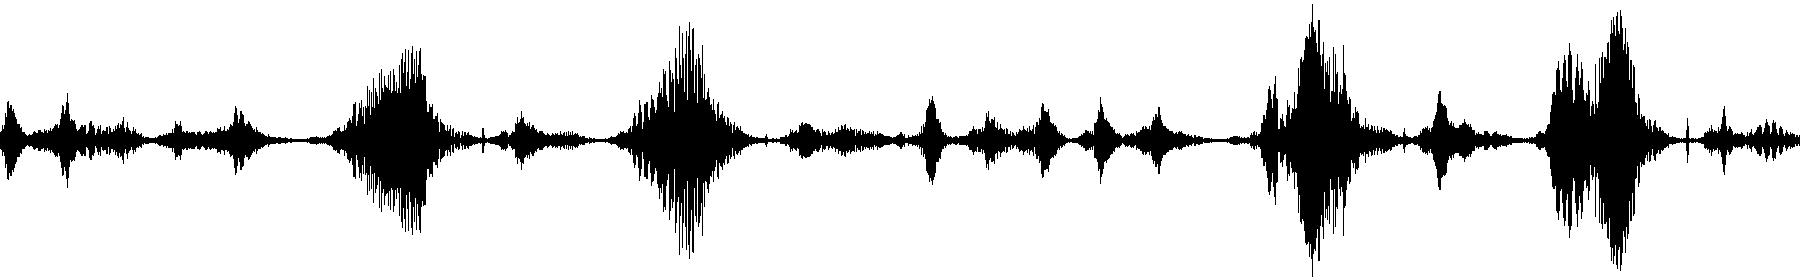 veh2 special sounds   37